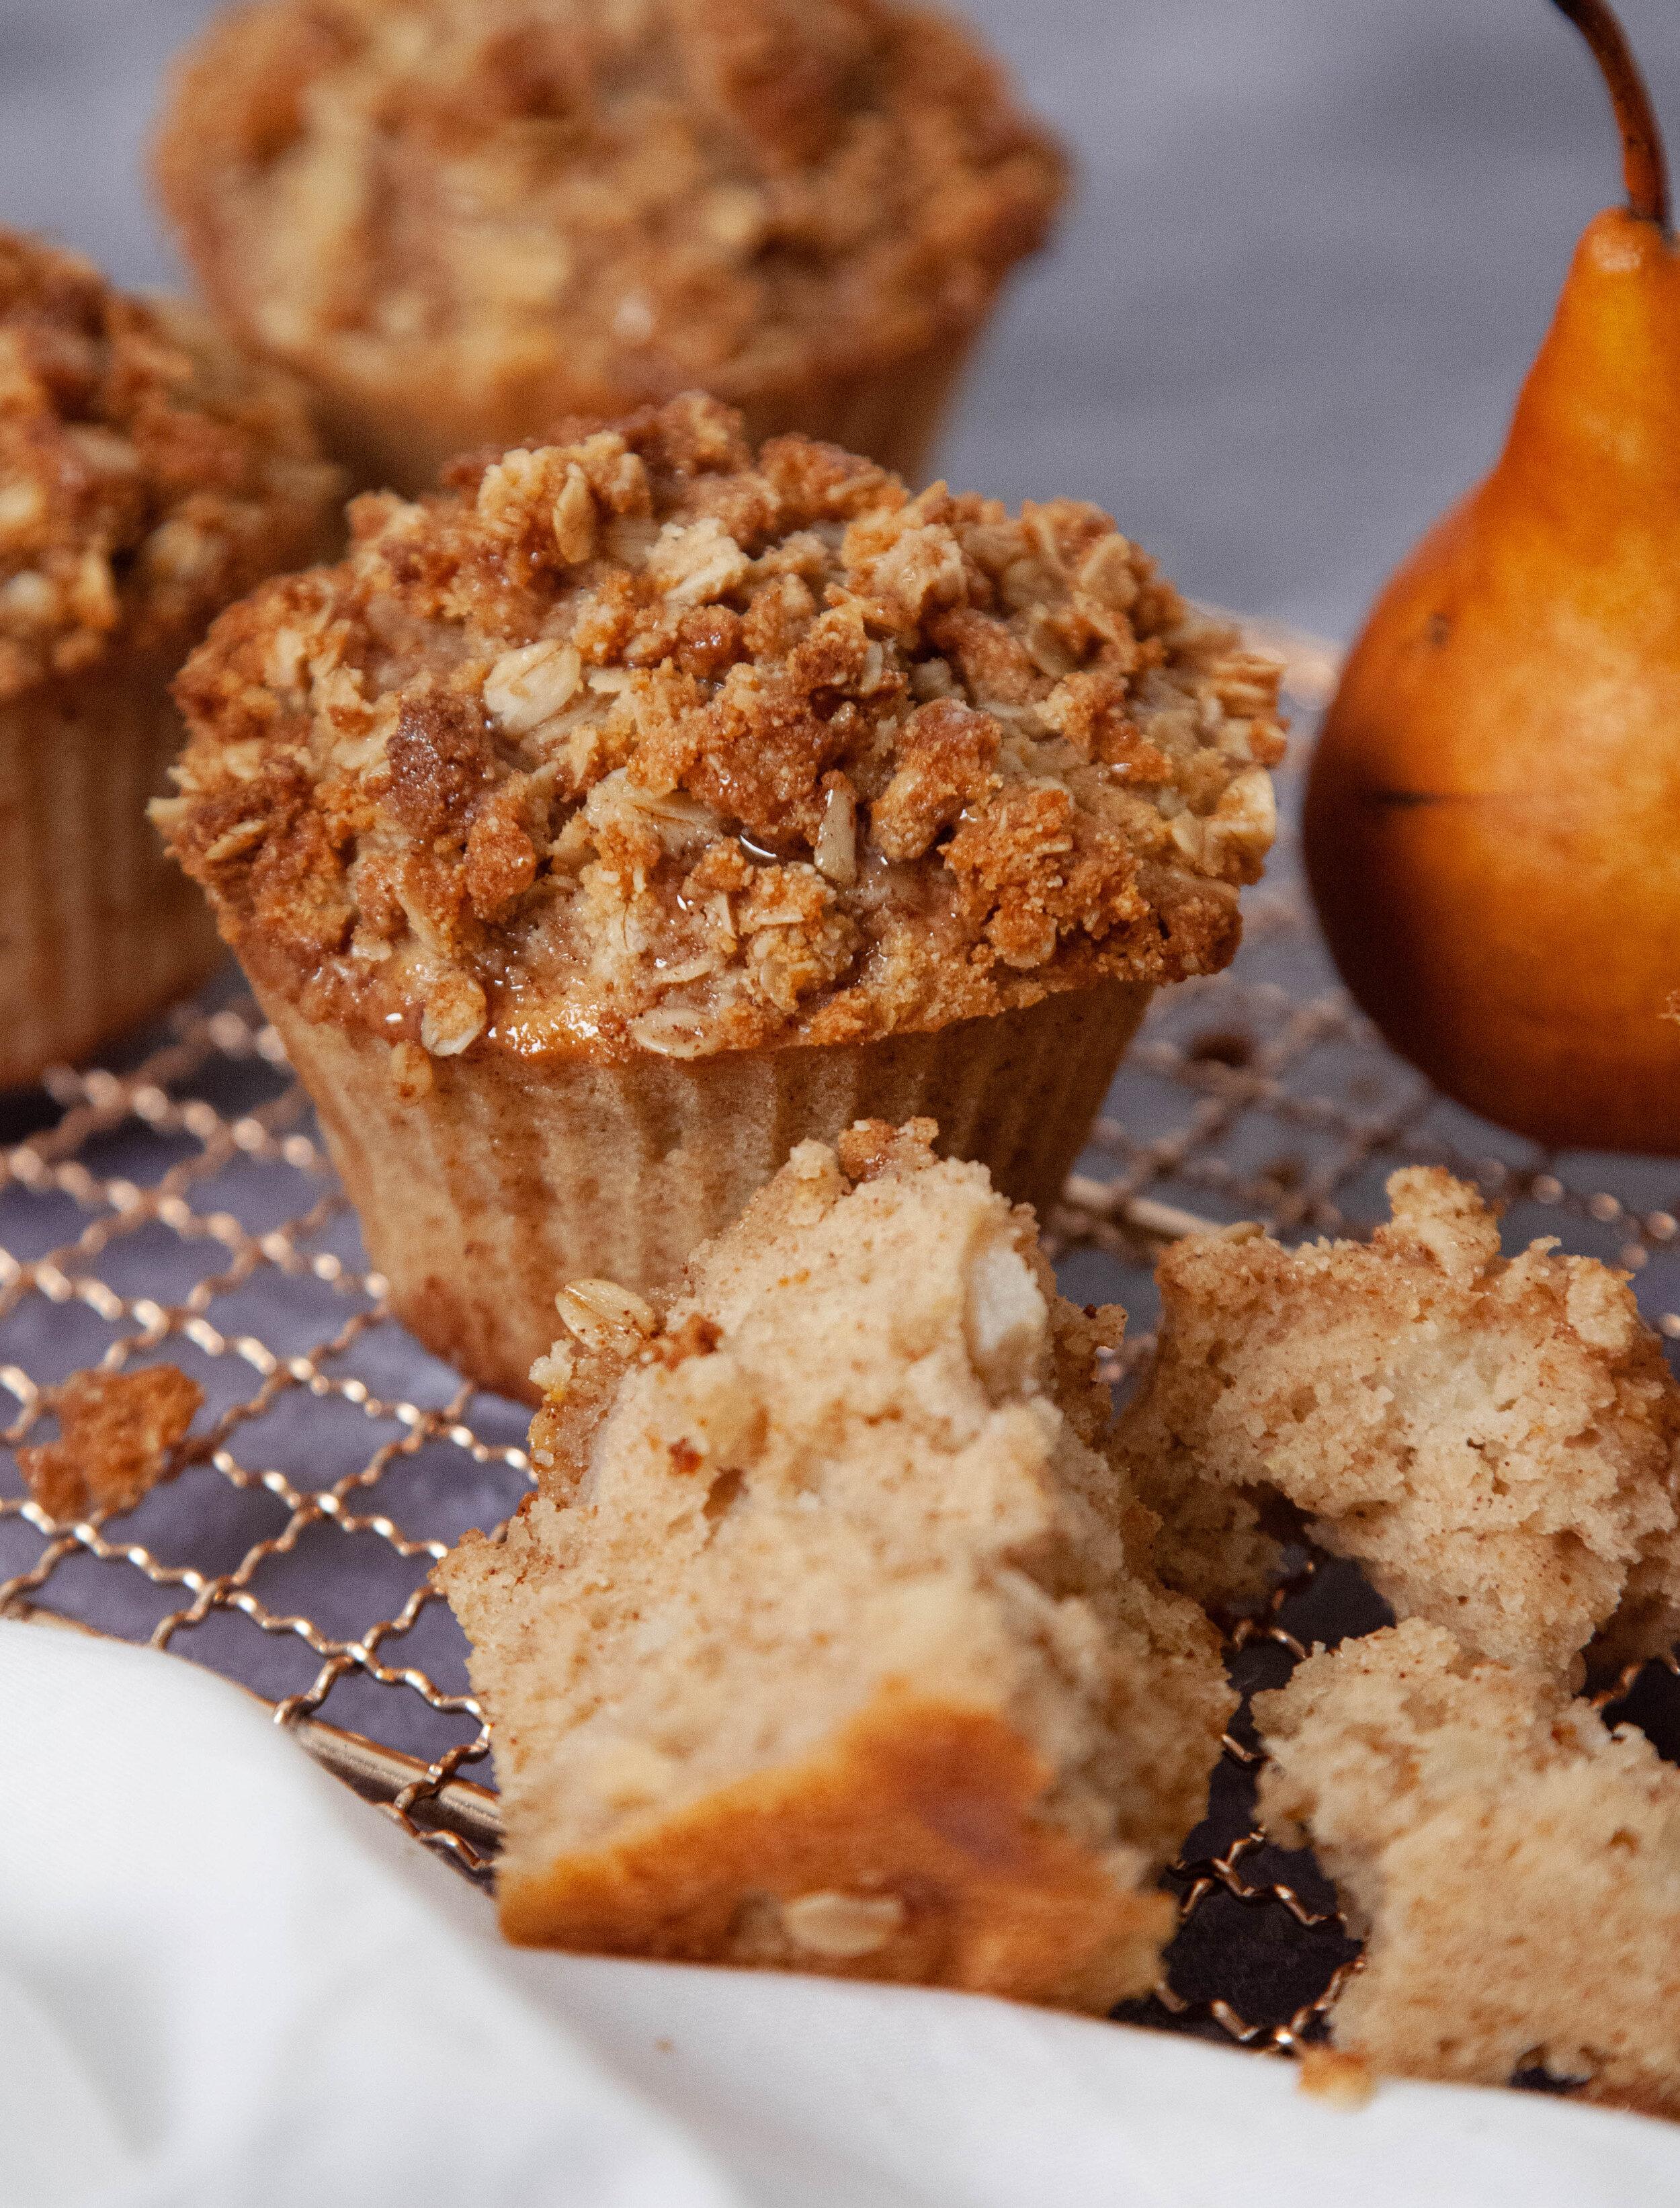 Pear and cardamom muffin